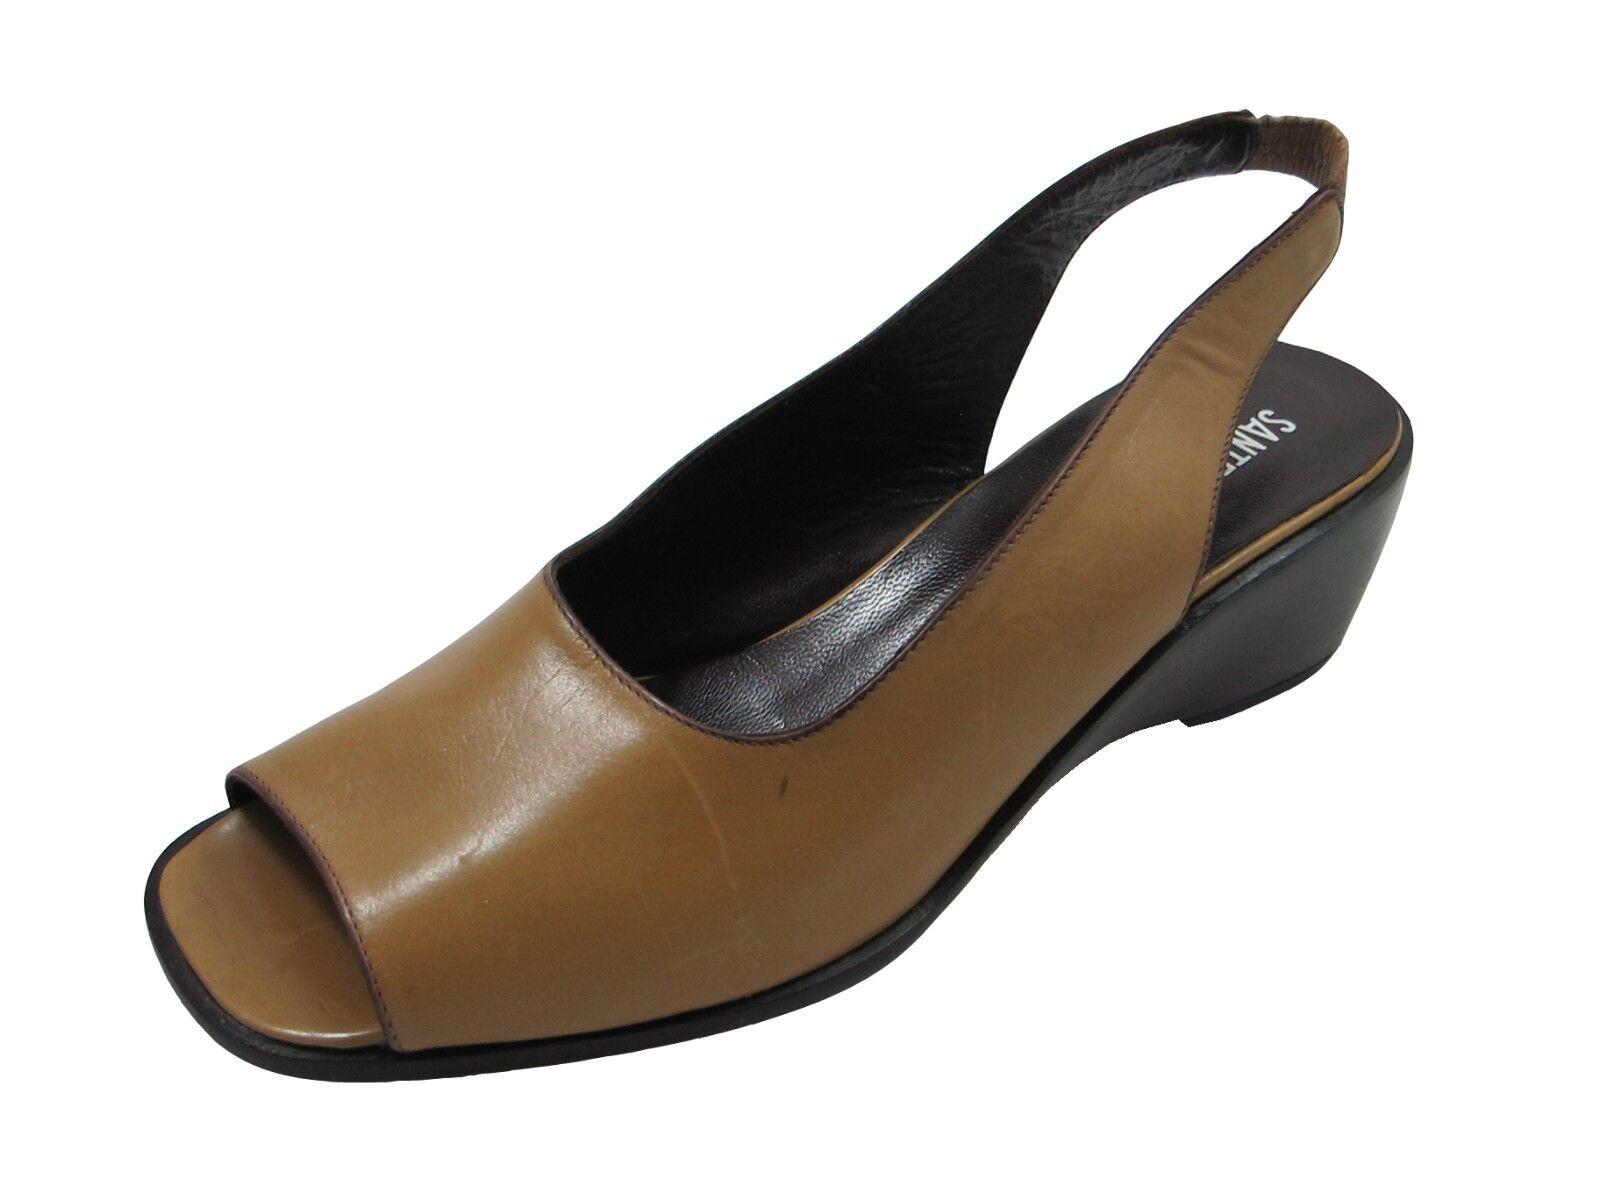 Santa Borella Designer 7213 Women's Italian Leather  Open Toe and Heel Sandal